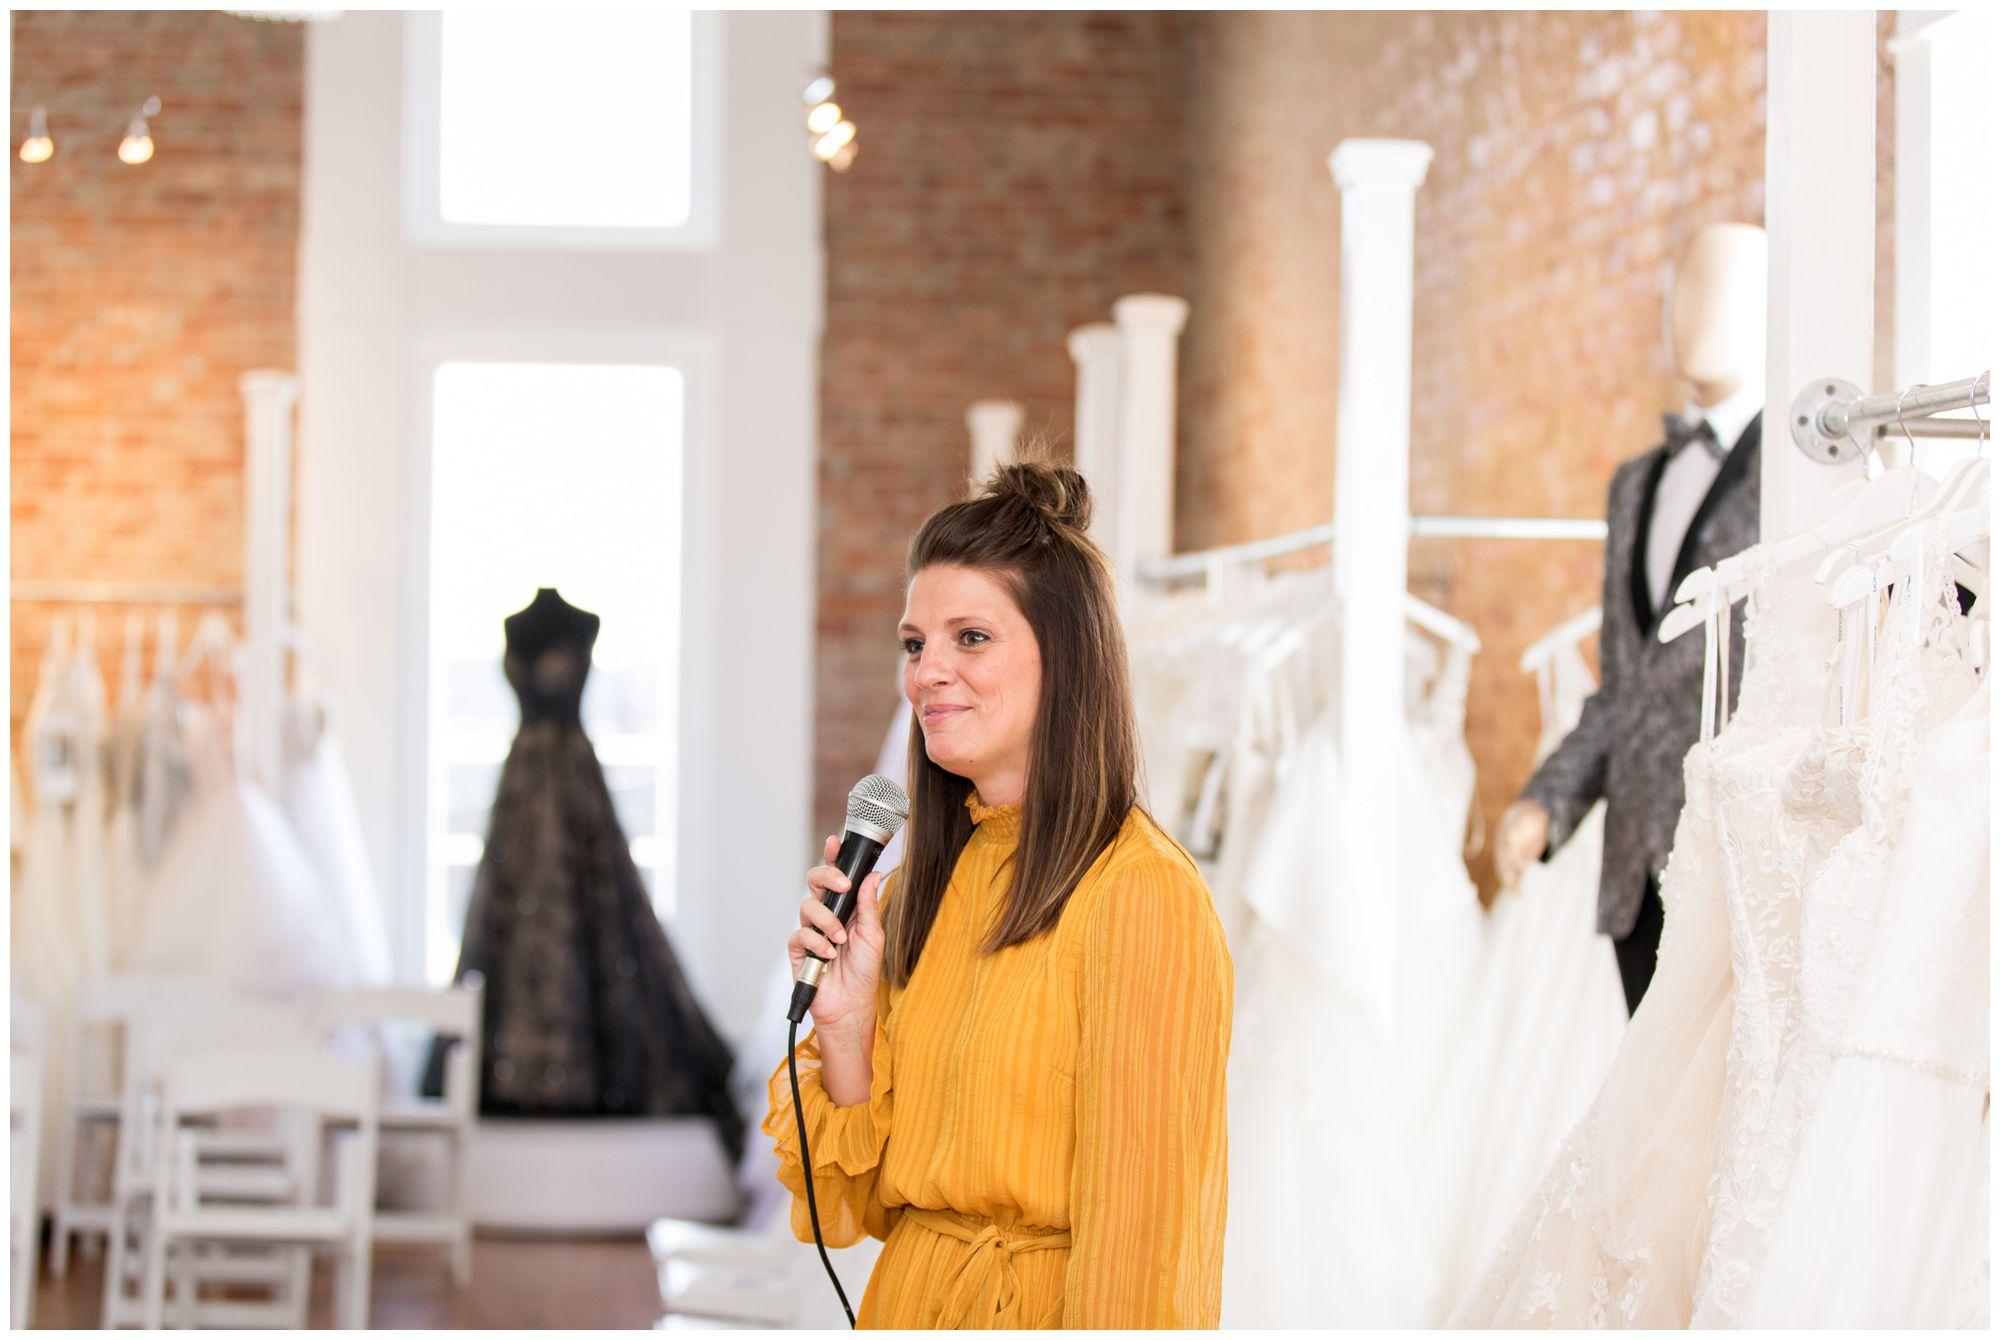 Allison Crim emceeing the Blye's Bridal fashion show